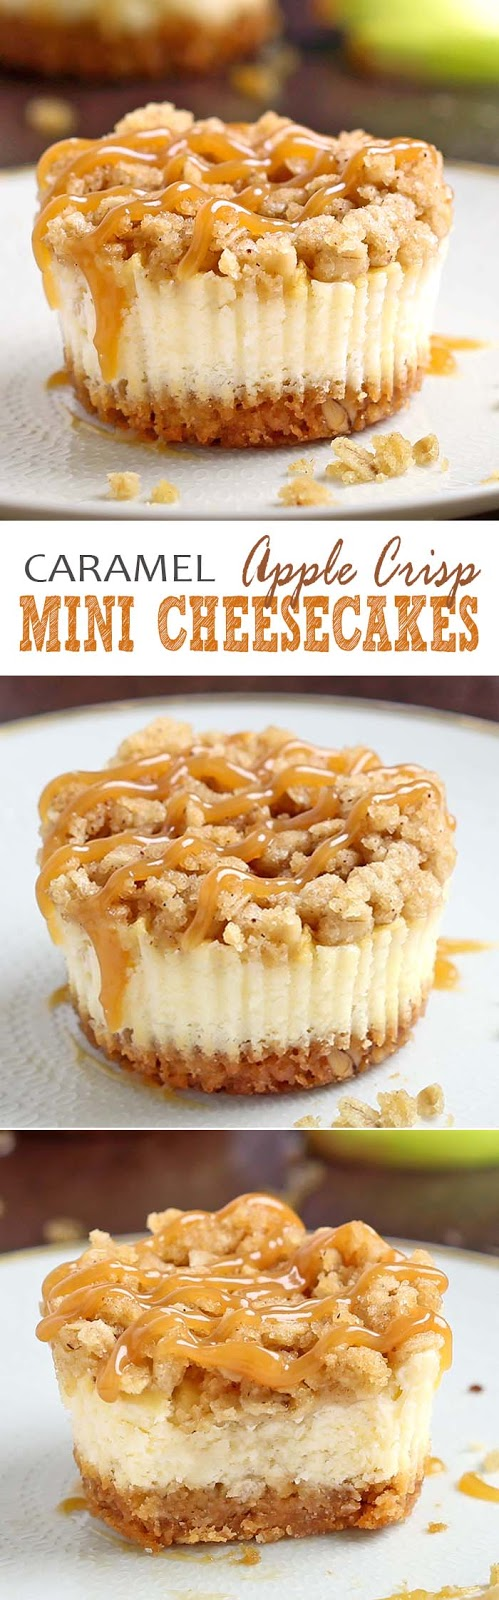 Caramel Apple Crisp Mini Cheesecakes Recipe